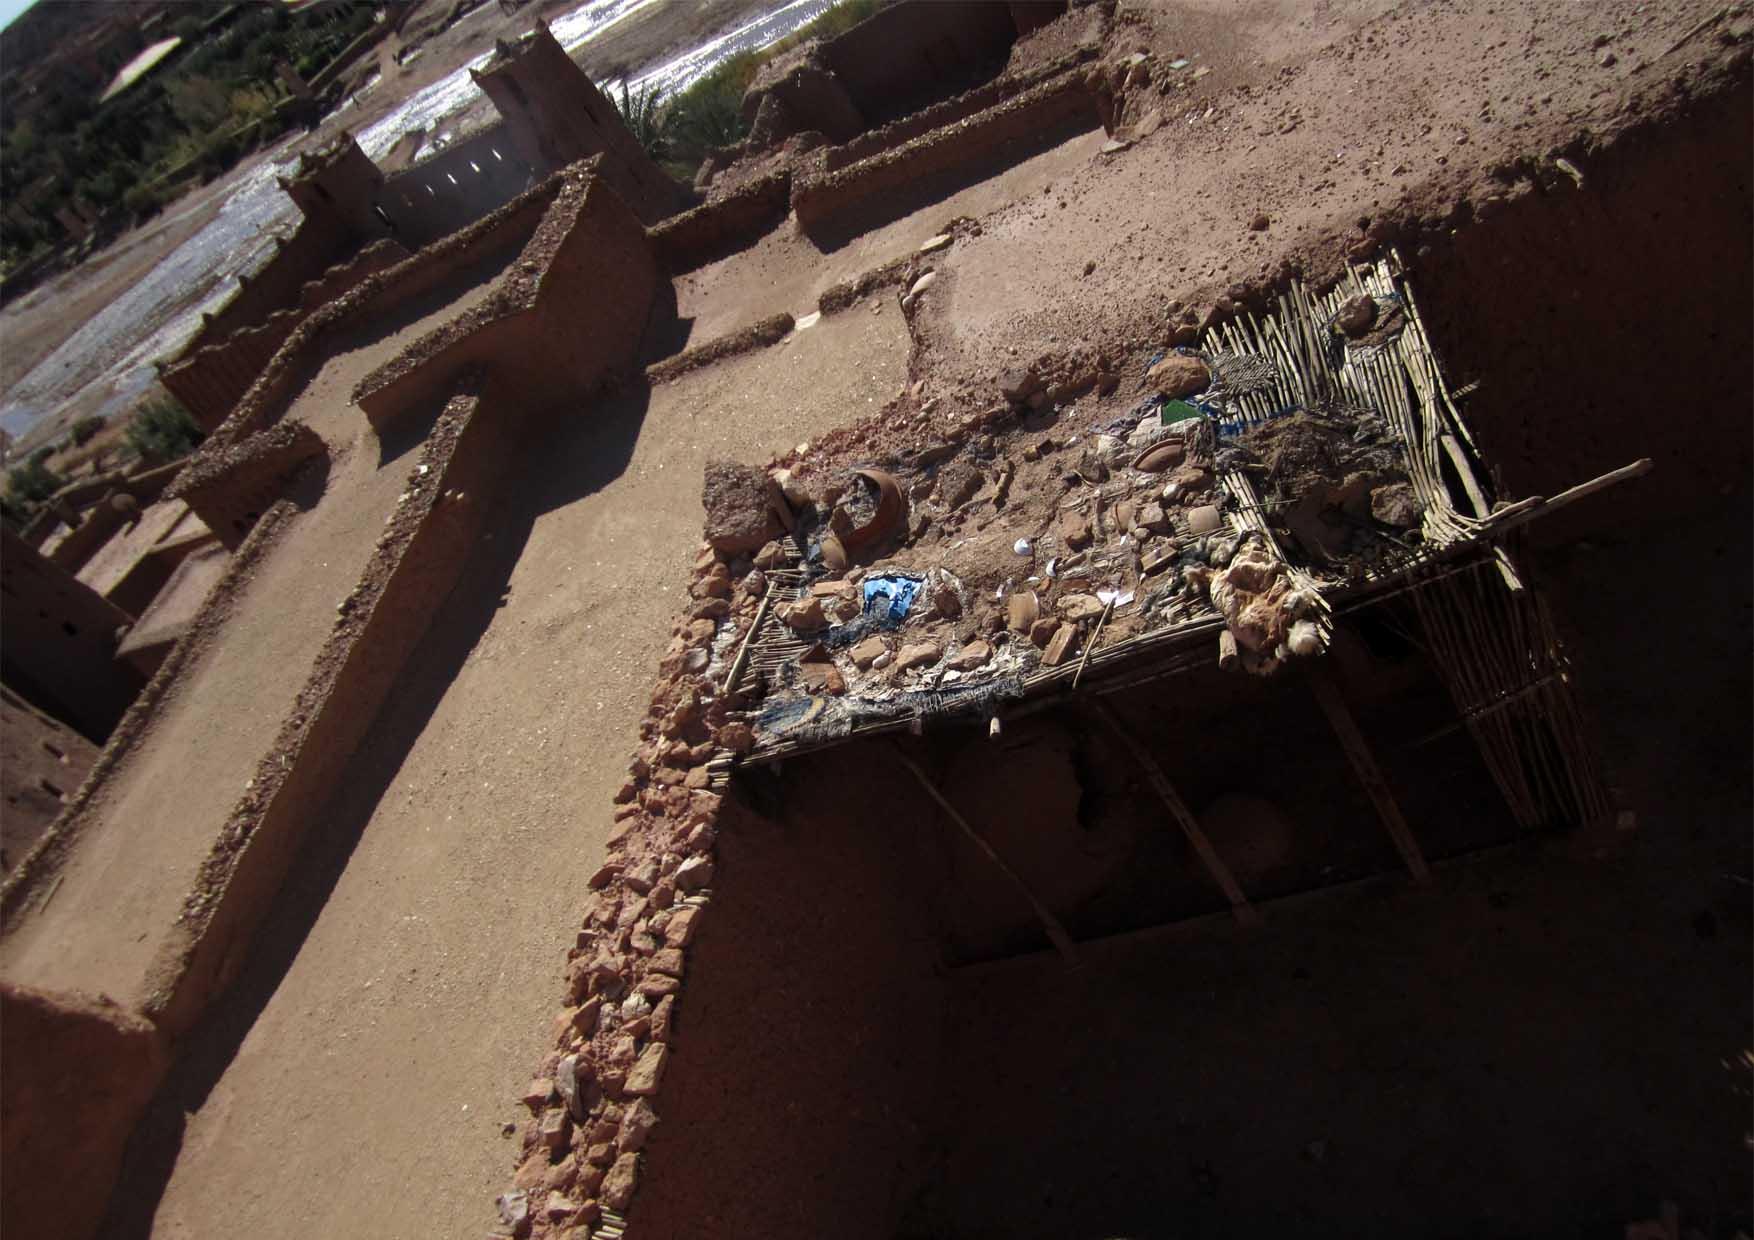 18 maroko ait ben haddou ravni krovovi i ovcice